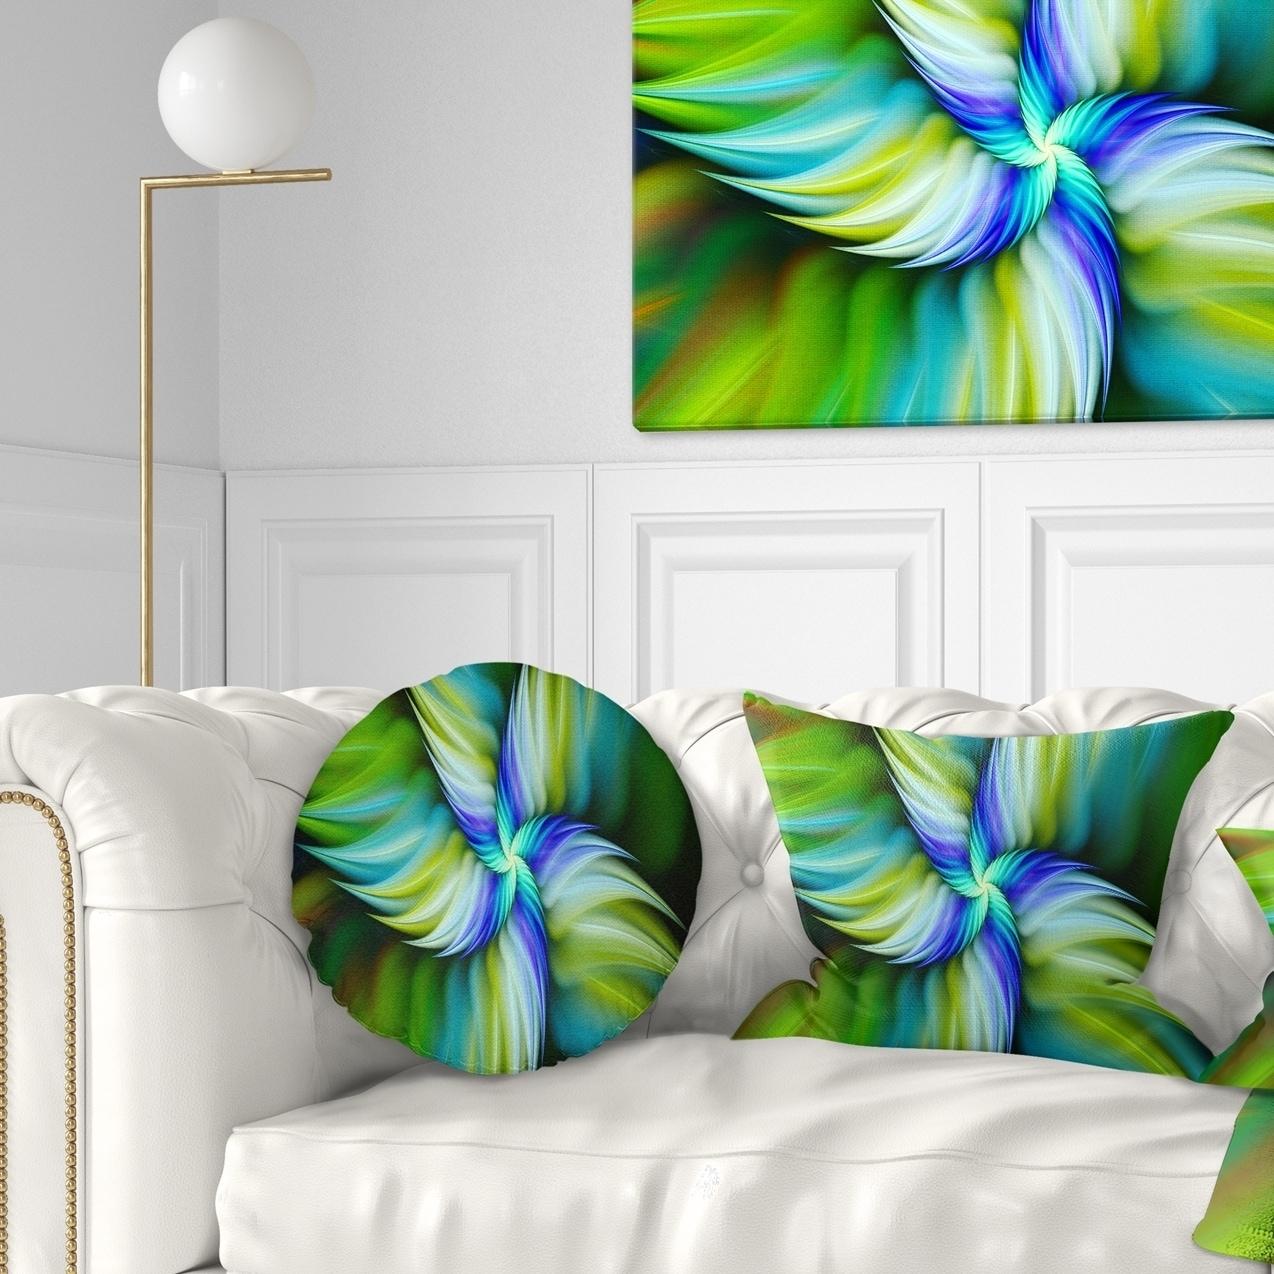 Sofa Throw Pillow 16 Designart Cu15539 16 16 C Rotating Fractal Green Star Floral Round Cushion